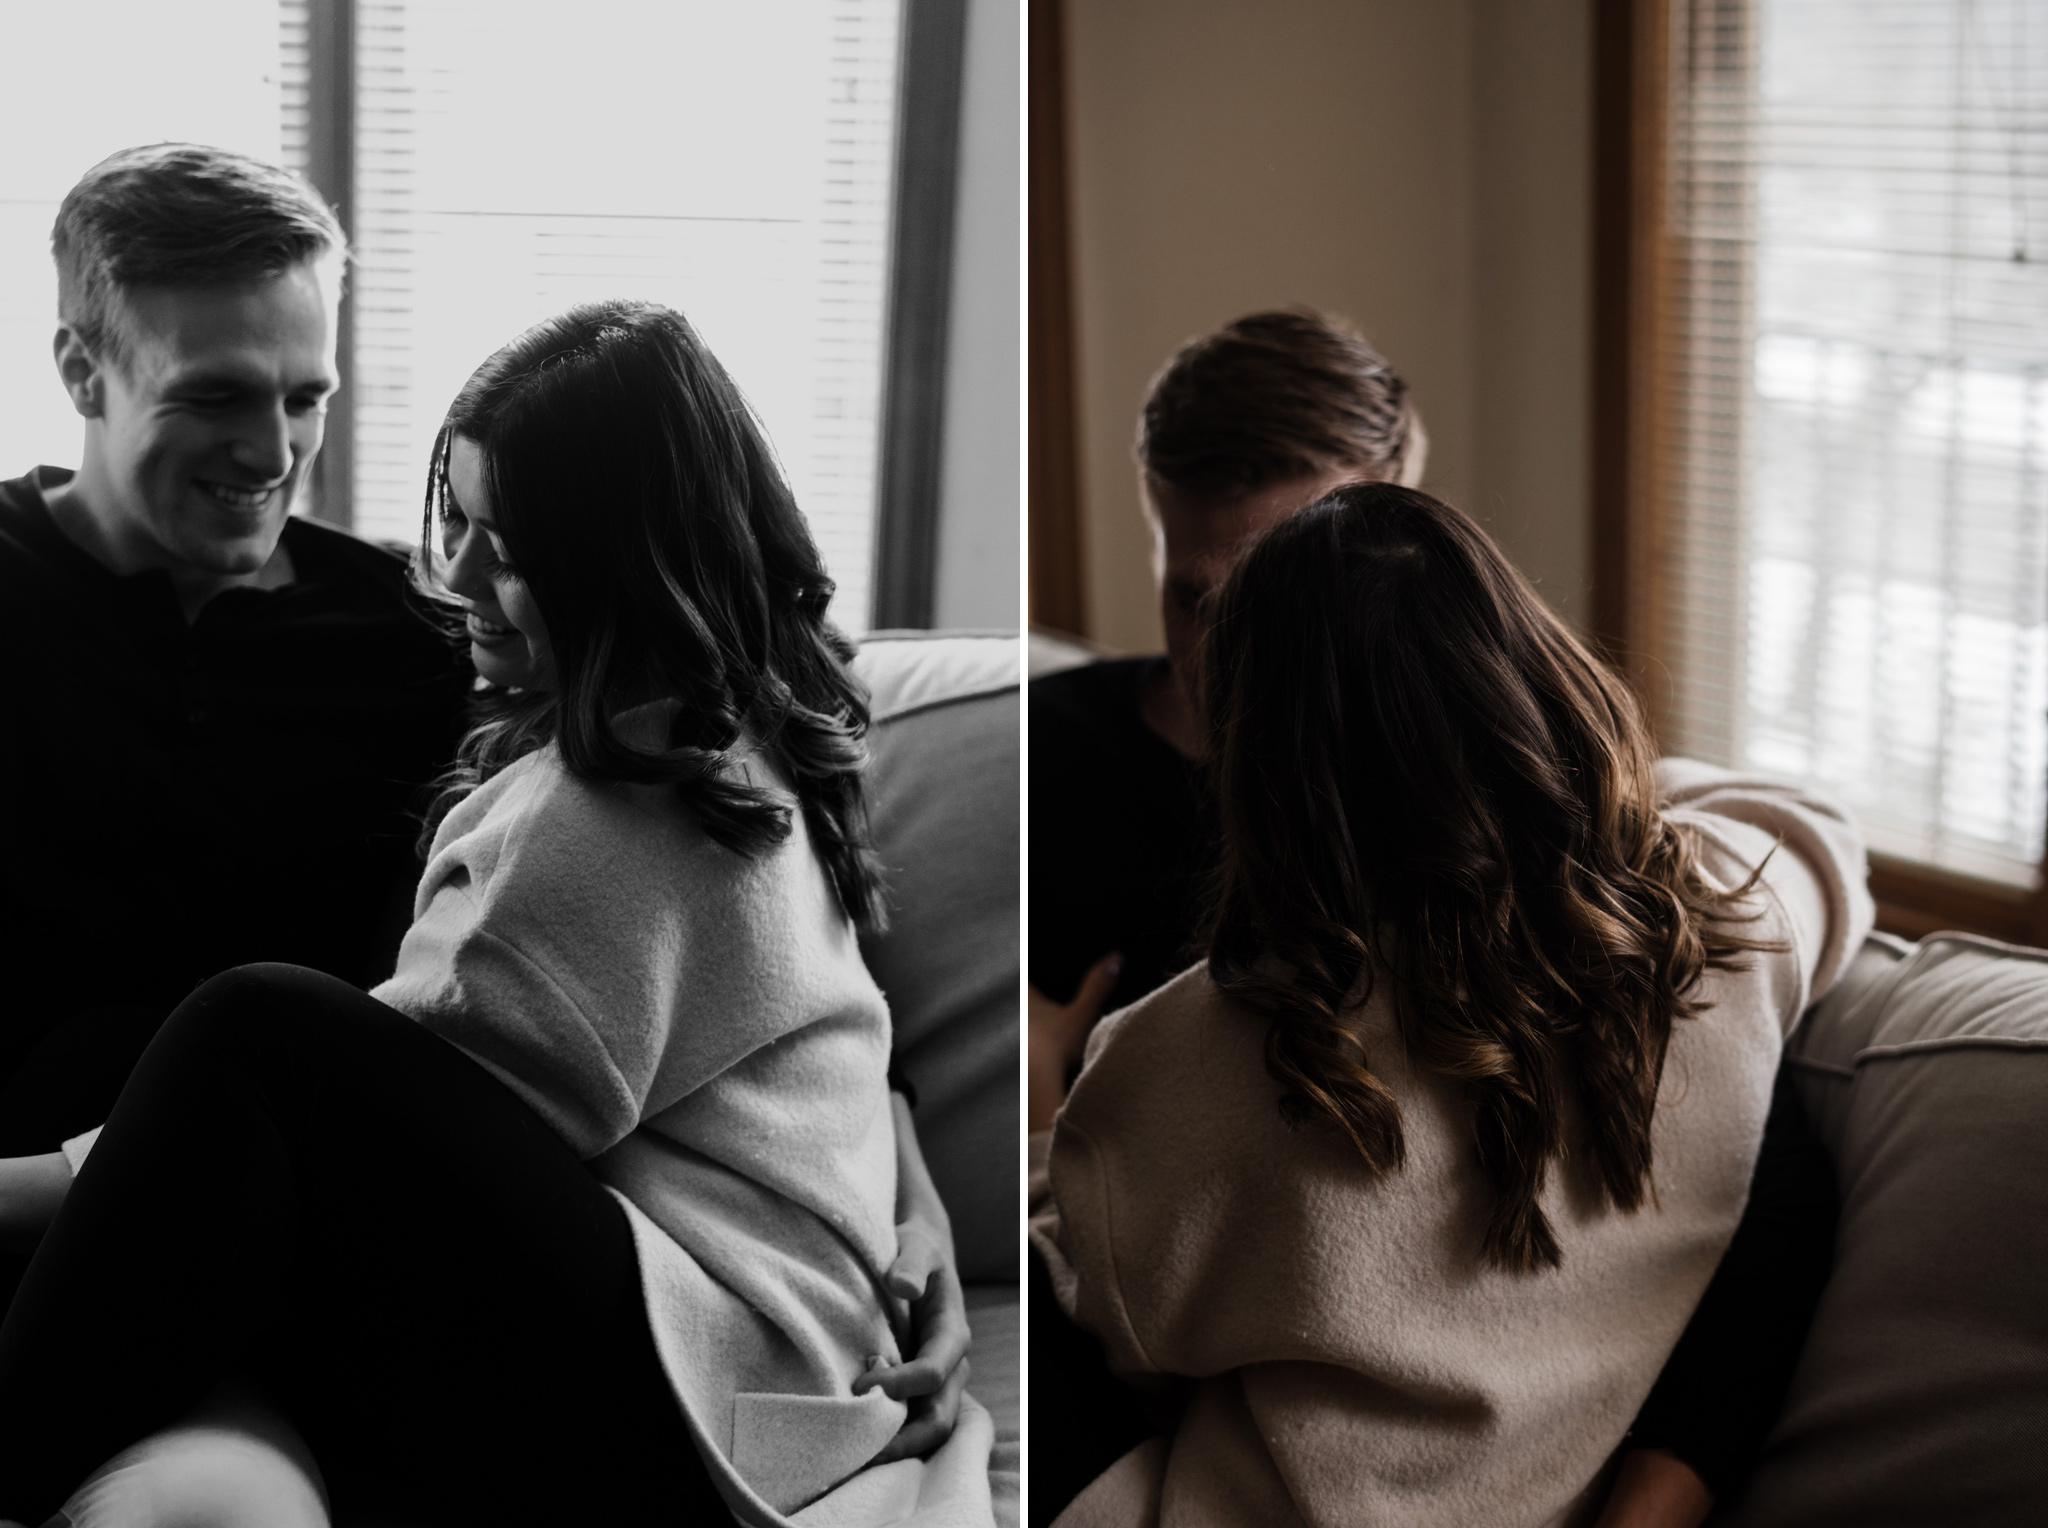 041-at-home-couples-session-toronto-photographer-wedding.jpg